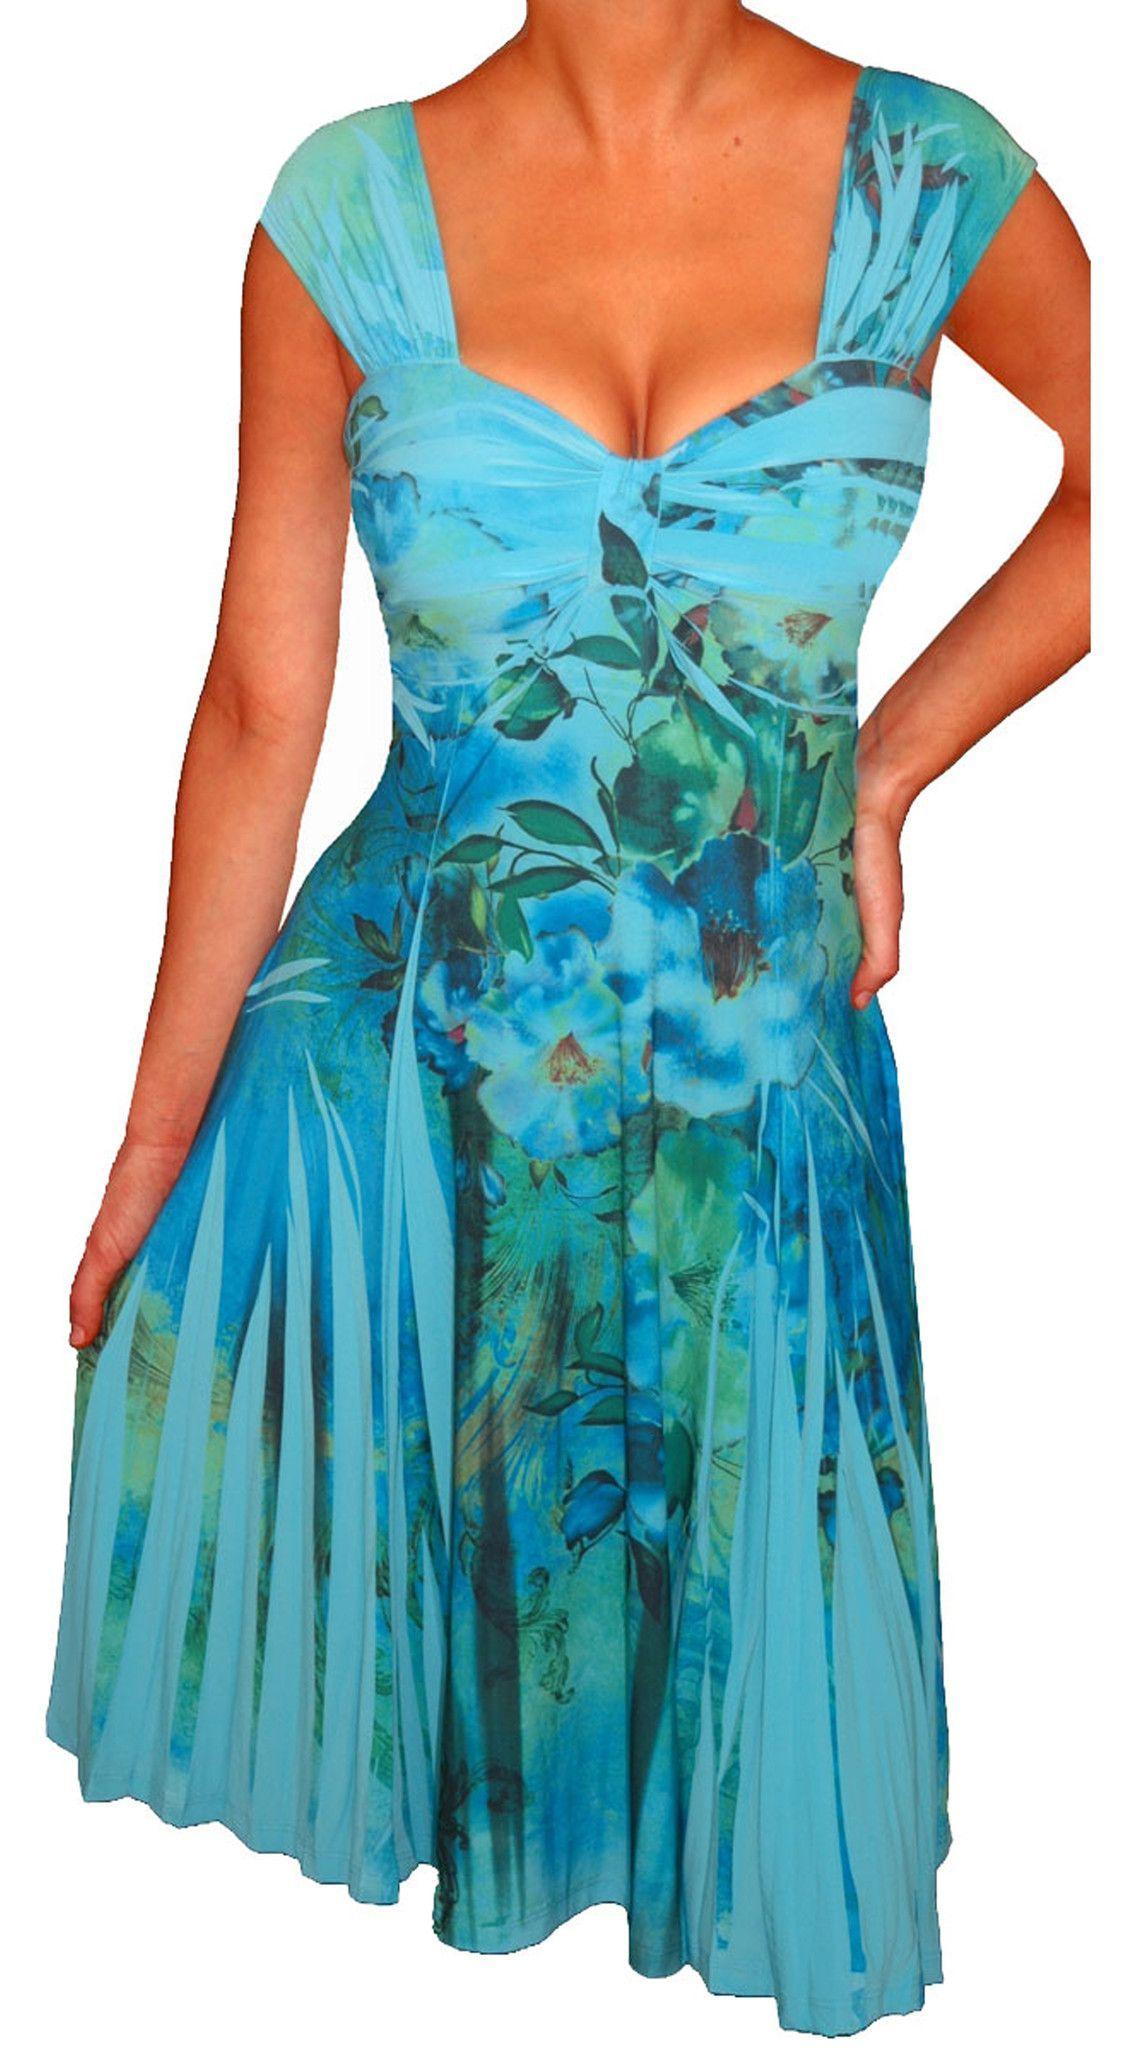 322eb13afc0 Funfash Plus Size Blue Slimming Empire Waist Cocktail Cruise Dress – FunFash   cruiseoutfitscurvy